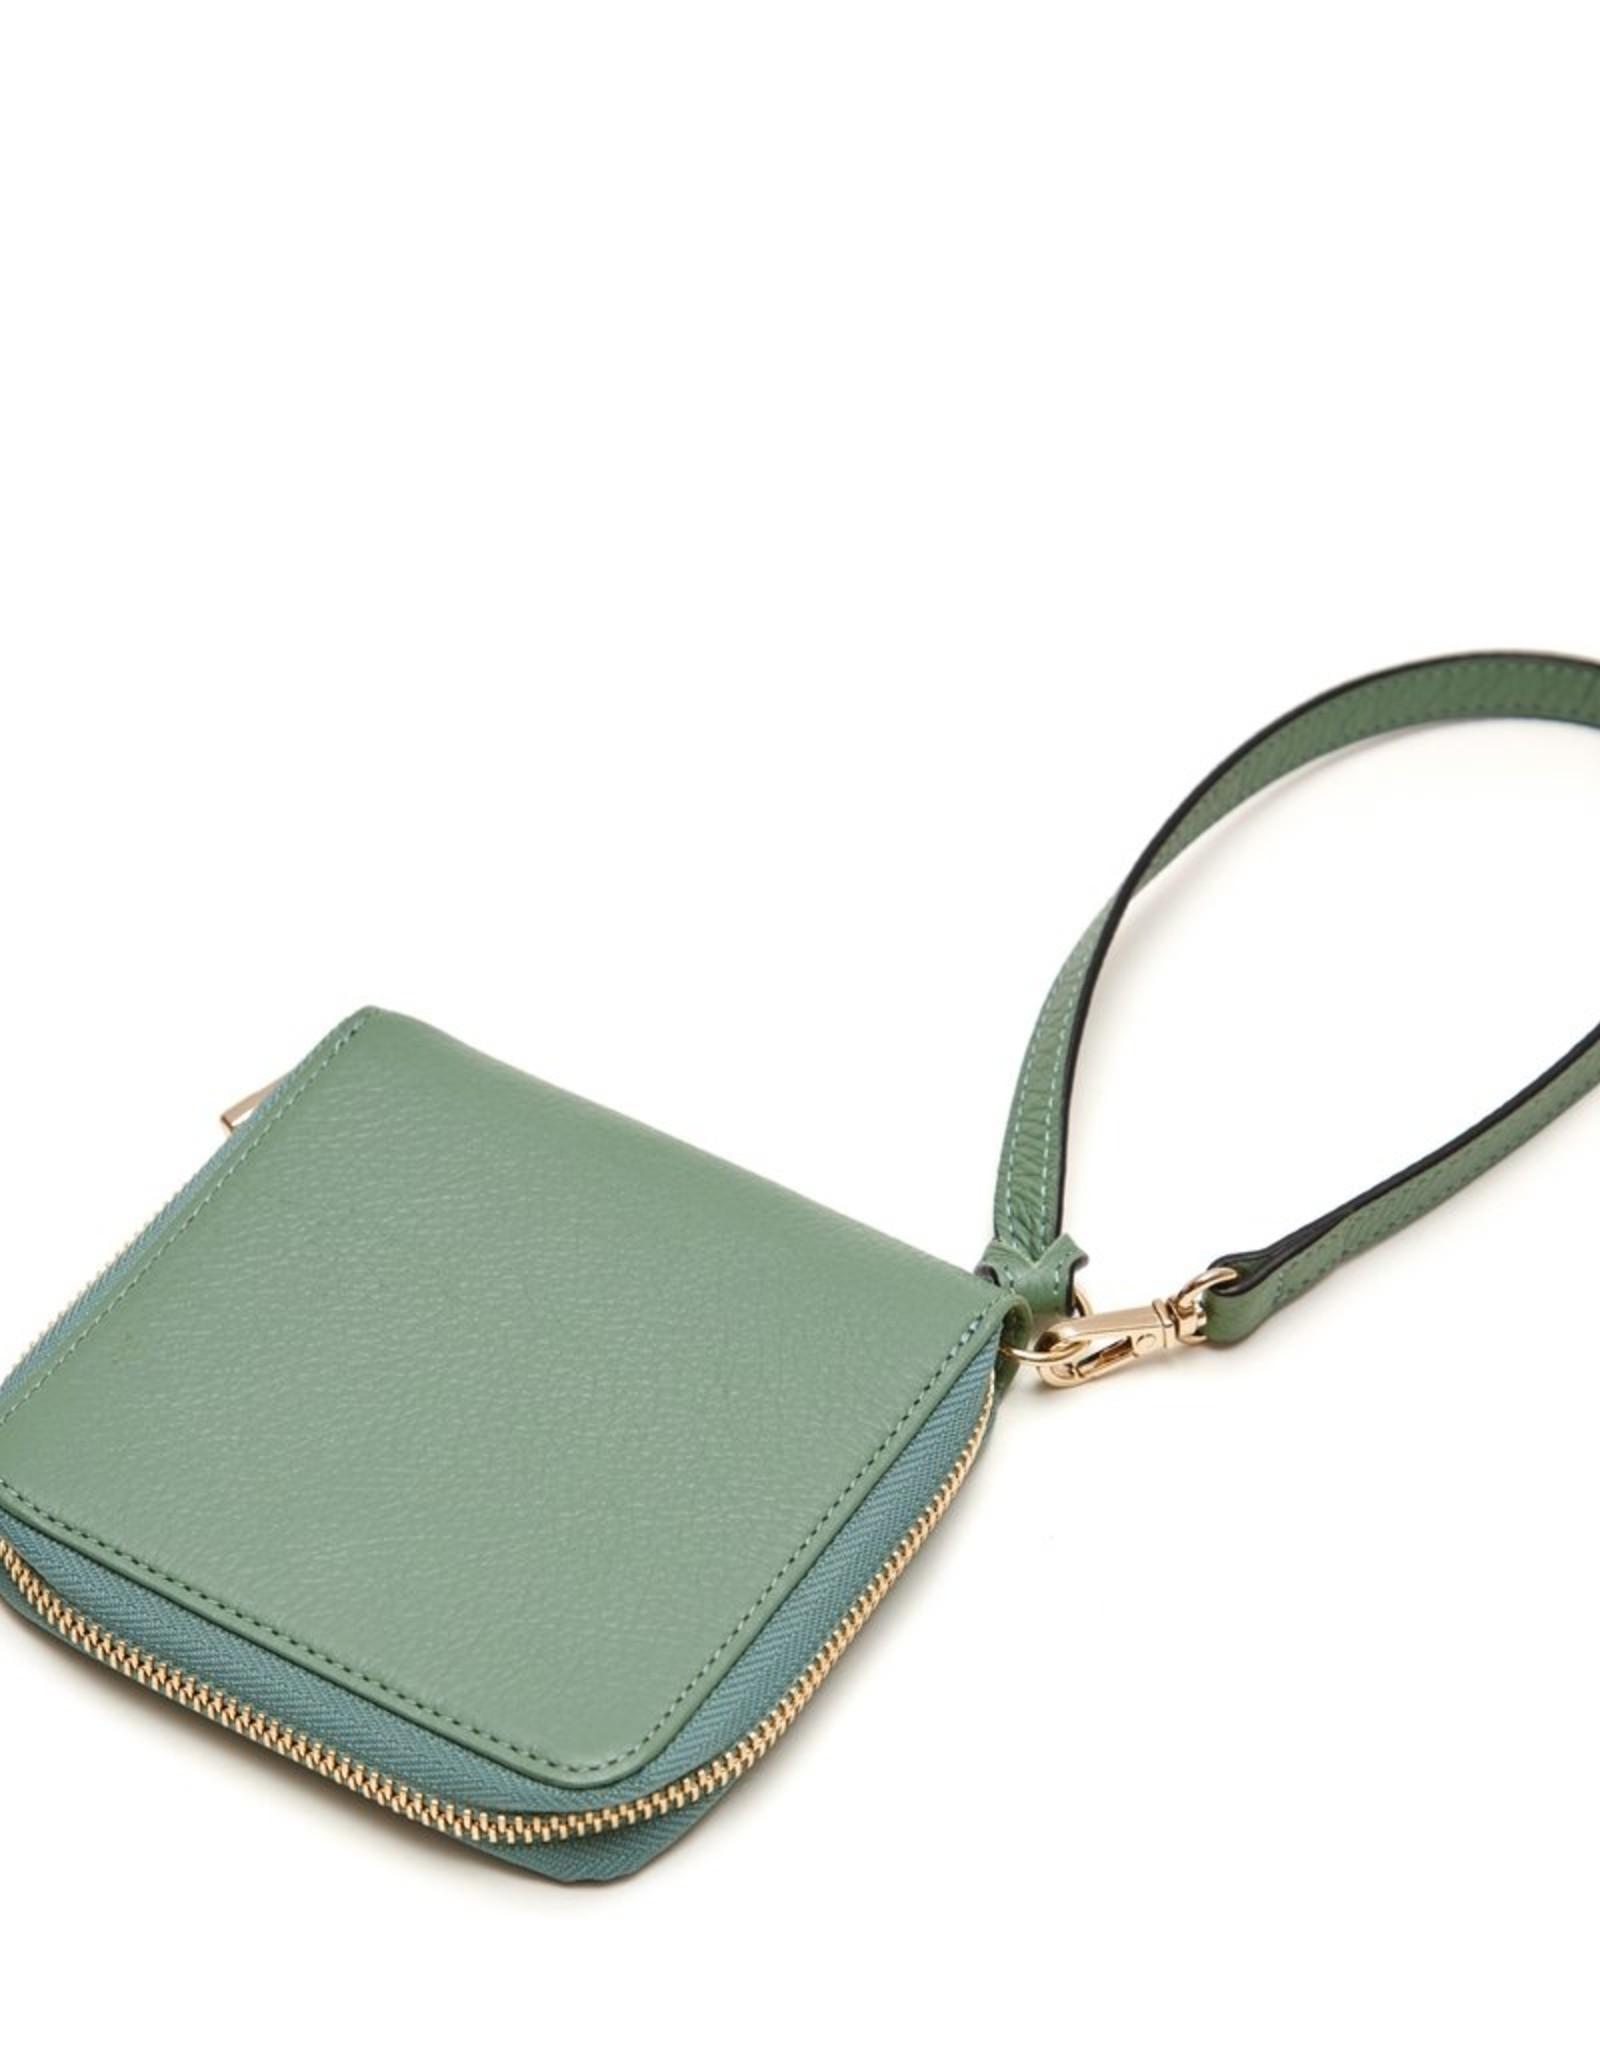 OAD Mimi Wallet